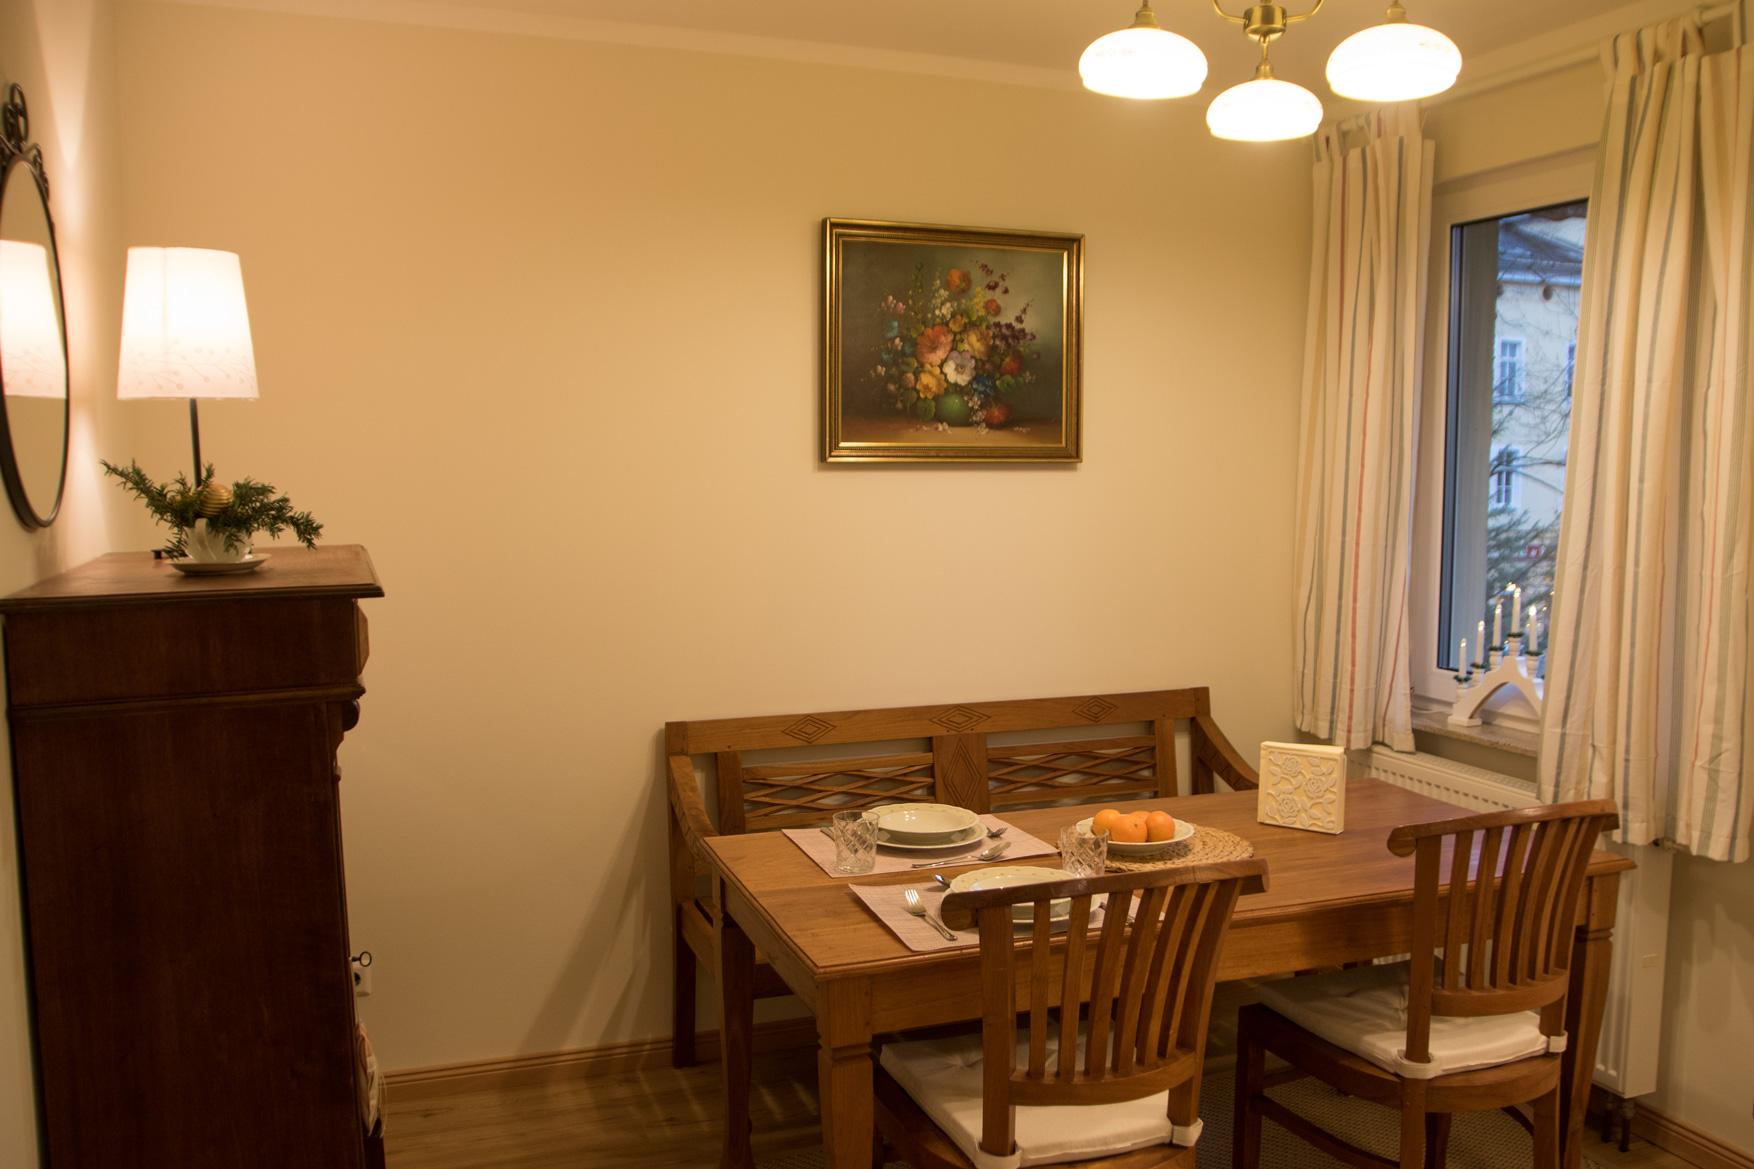 Apartment Postblick - Esszimmer